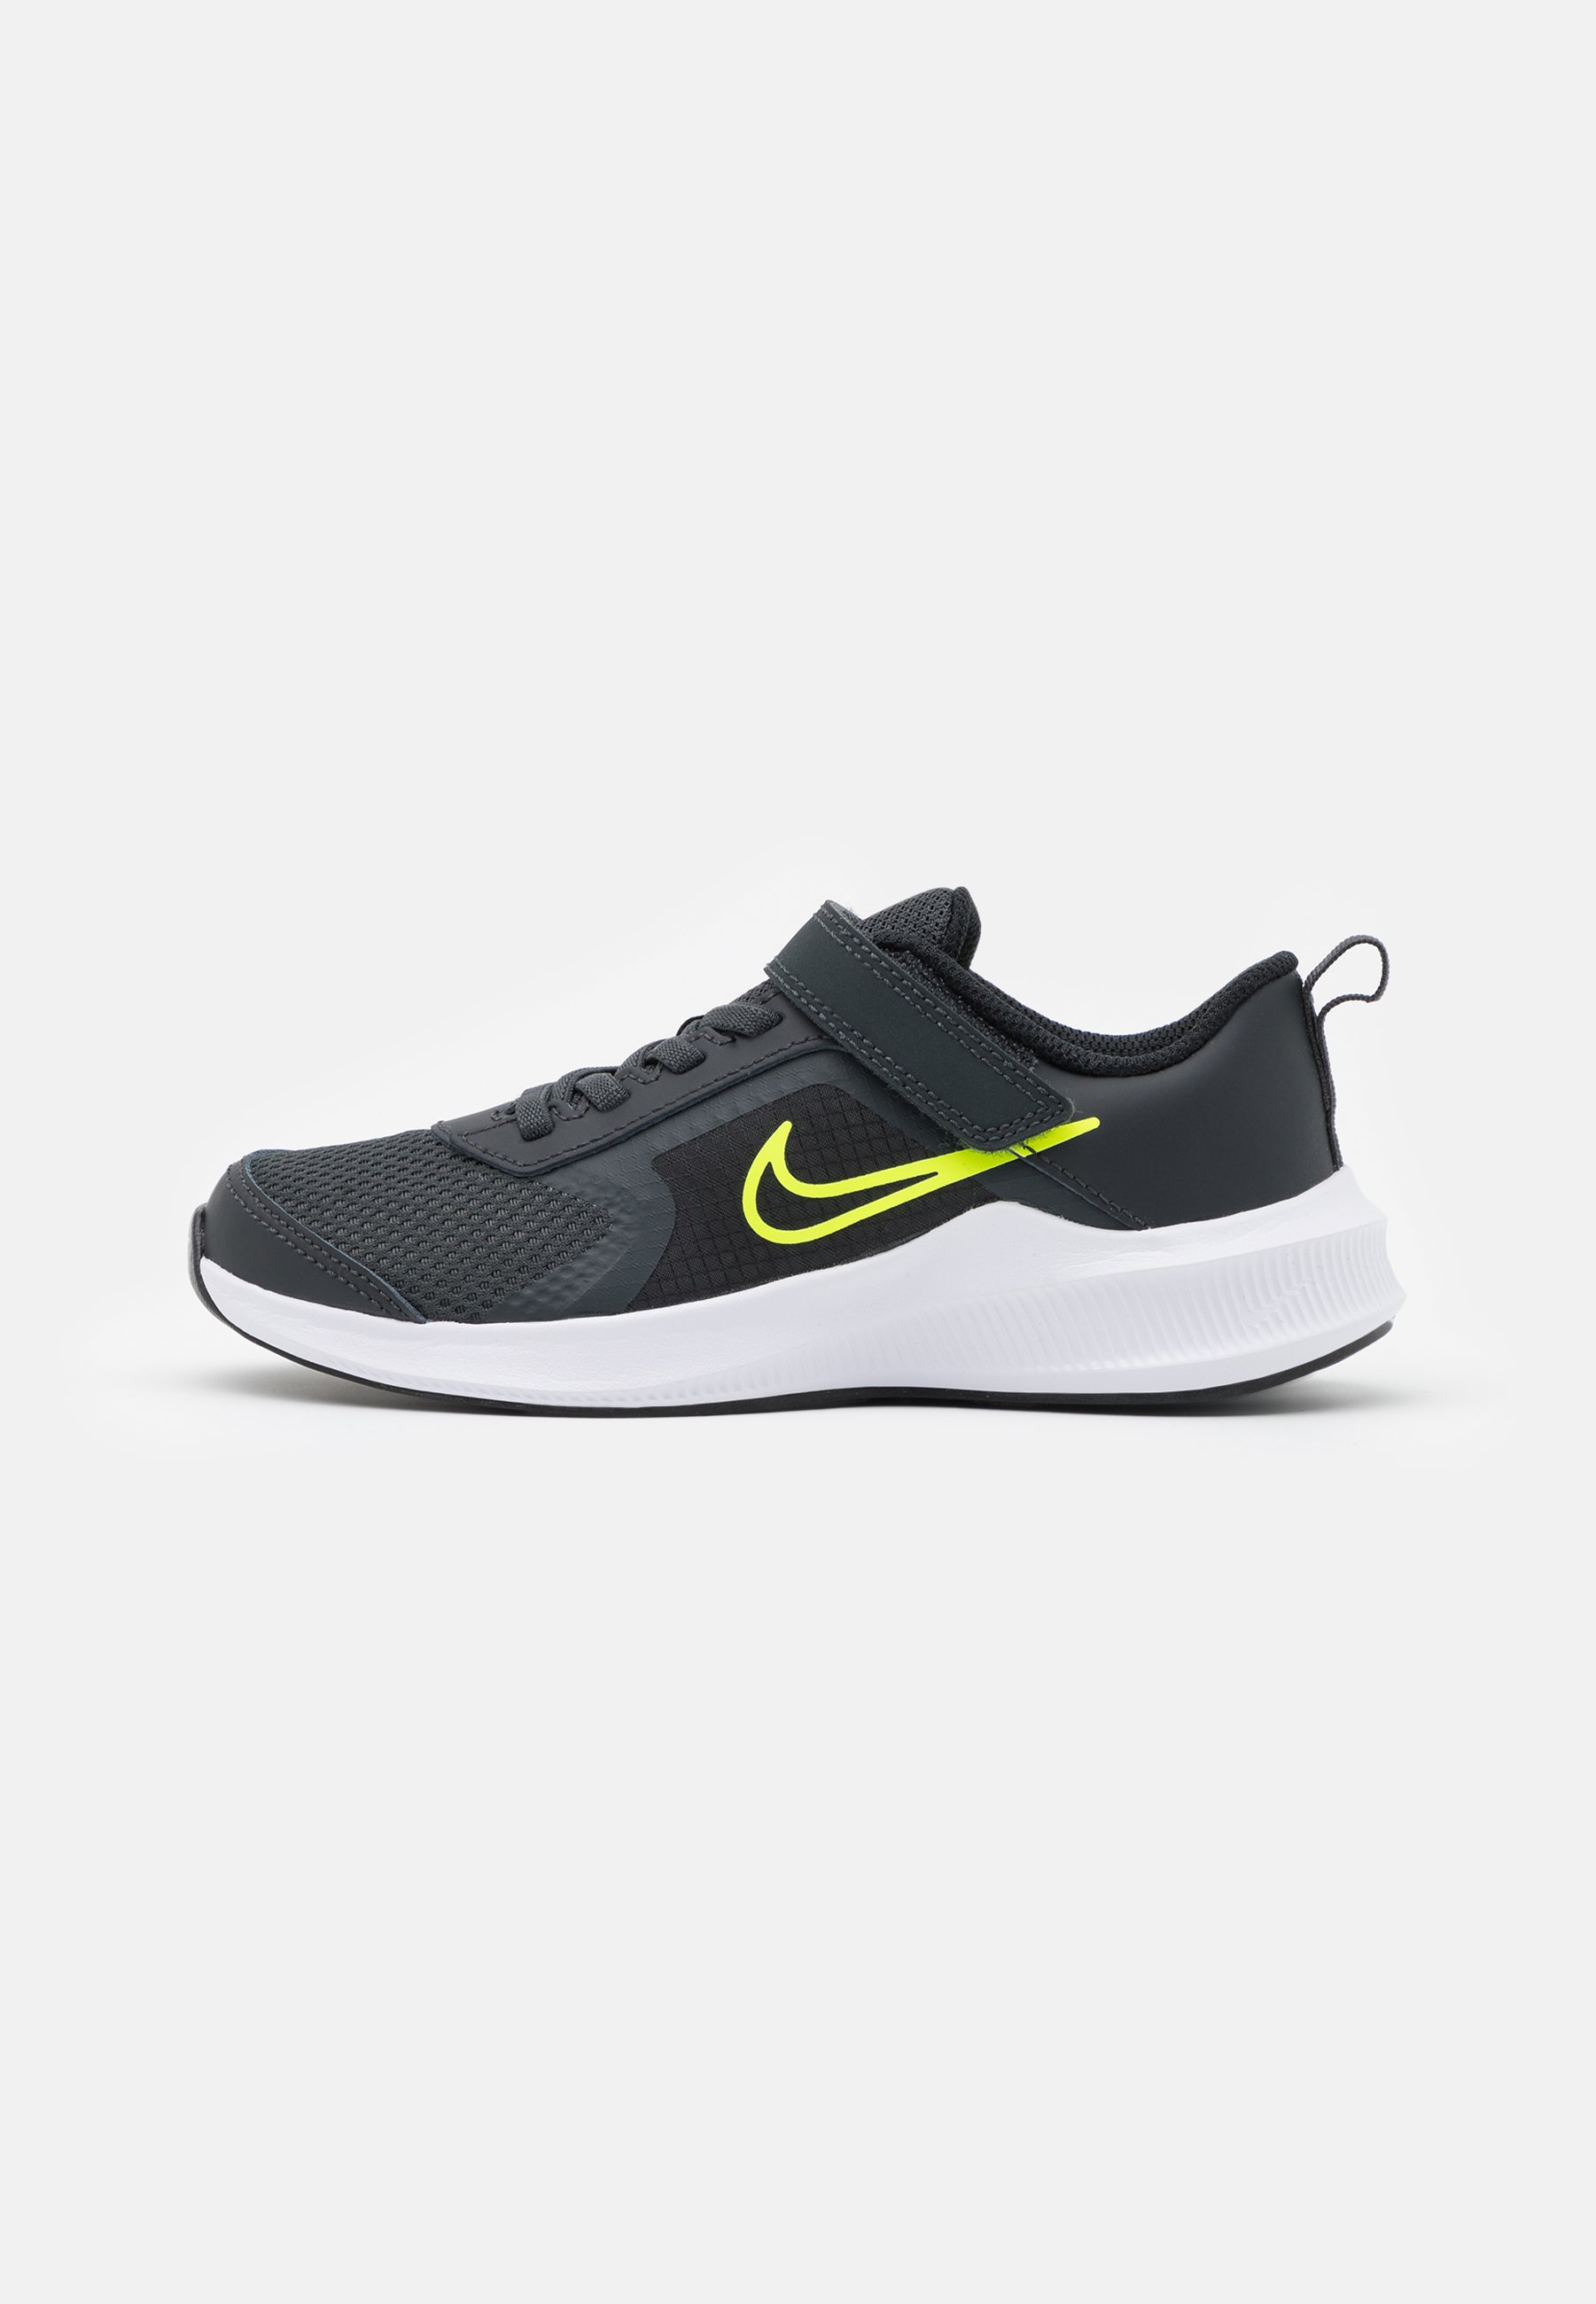 Enfant DOWNSHIFTER 11 UNISEX - Chaussures de running neutres